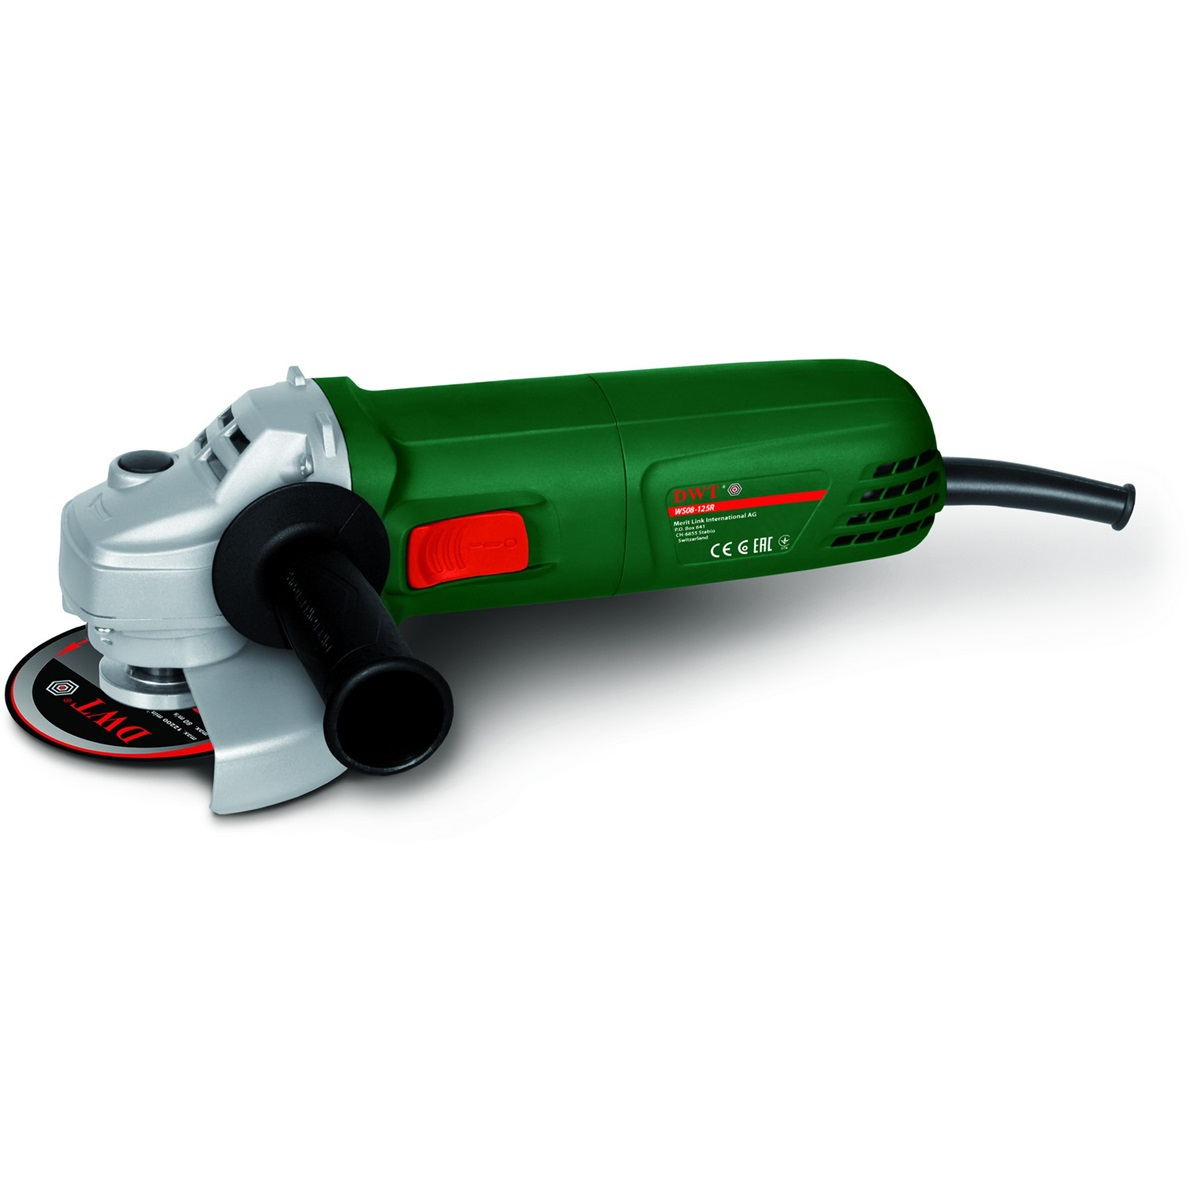 elektrická úhlová bruska 125 mm DWT WS08-125R